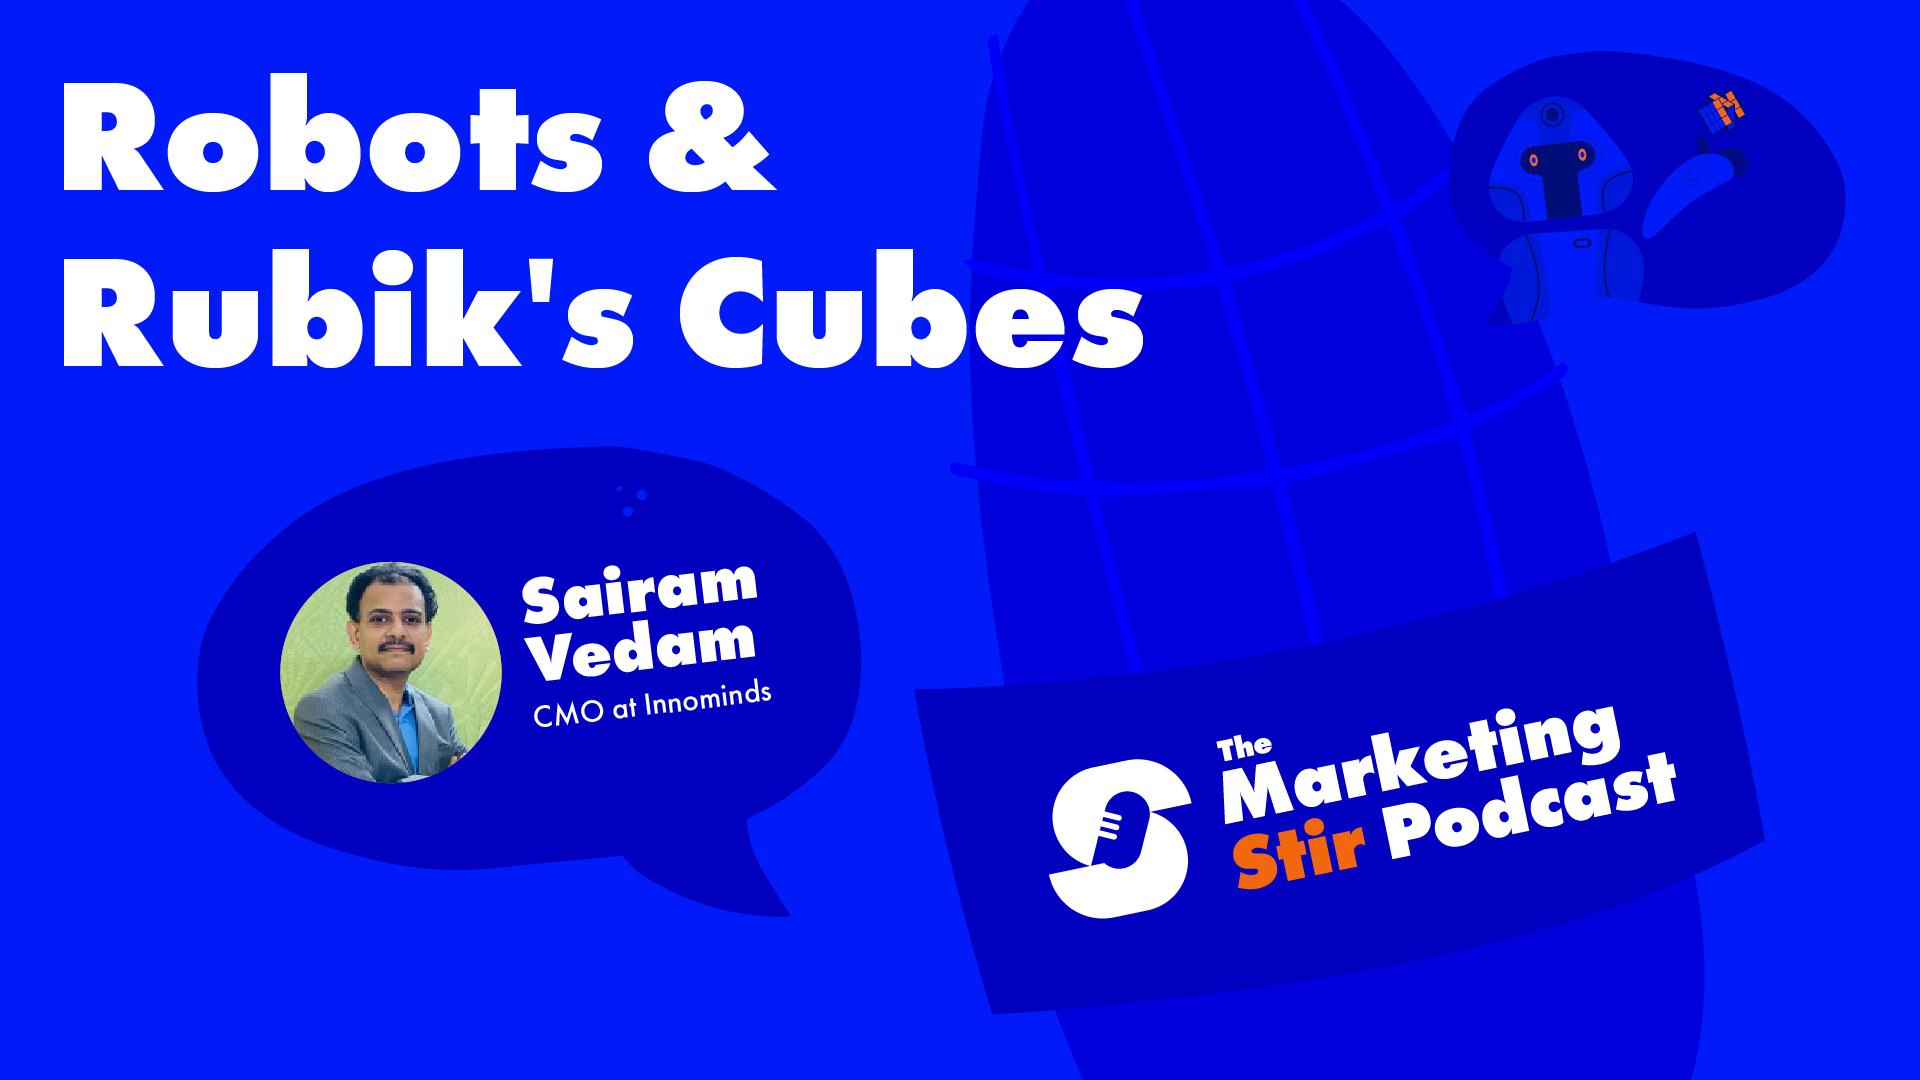 Sairam Vedam (Innominds) - Robots & Rubik's Cubes